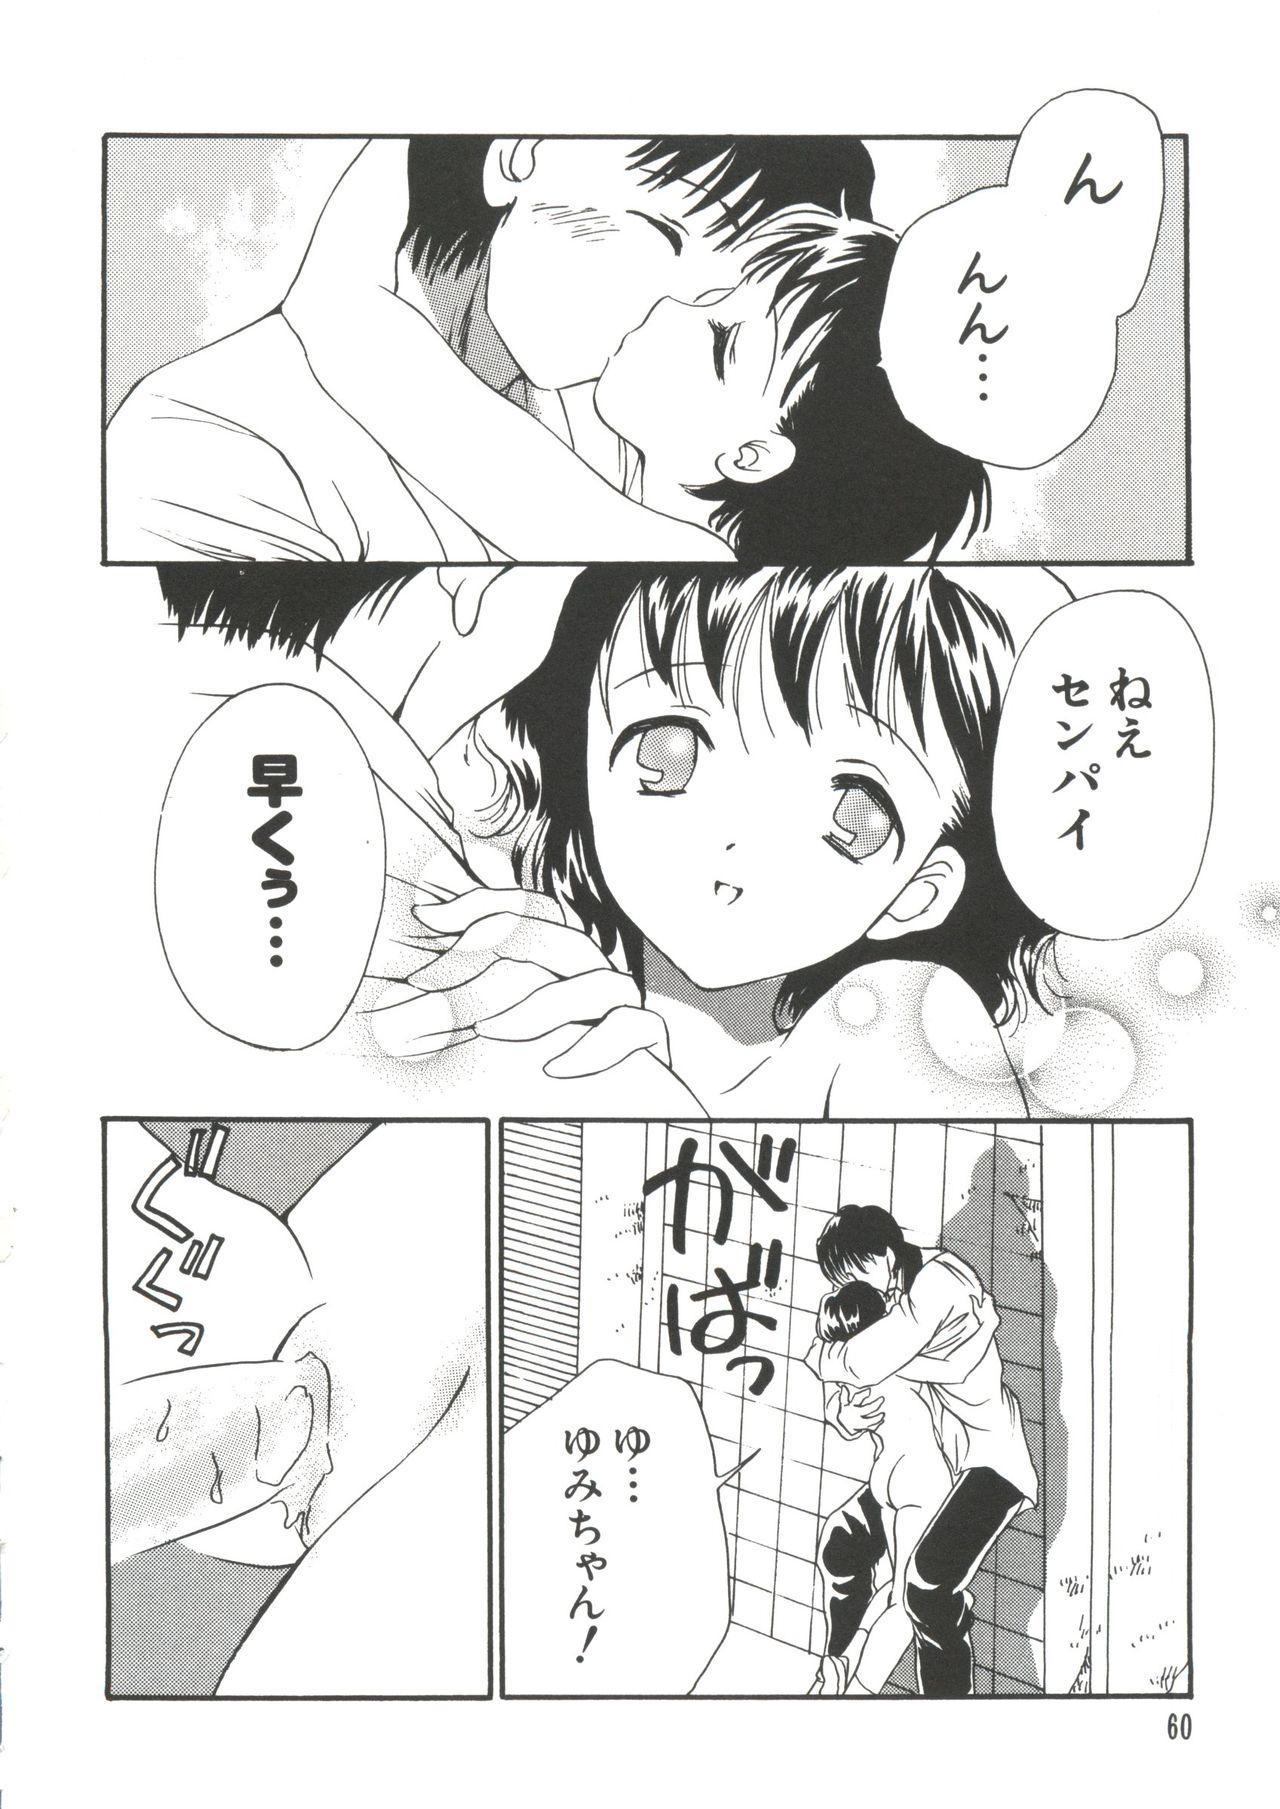 Naru Hina Z 2 59